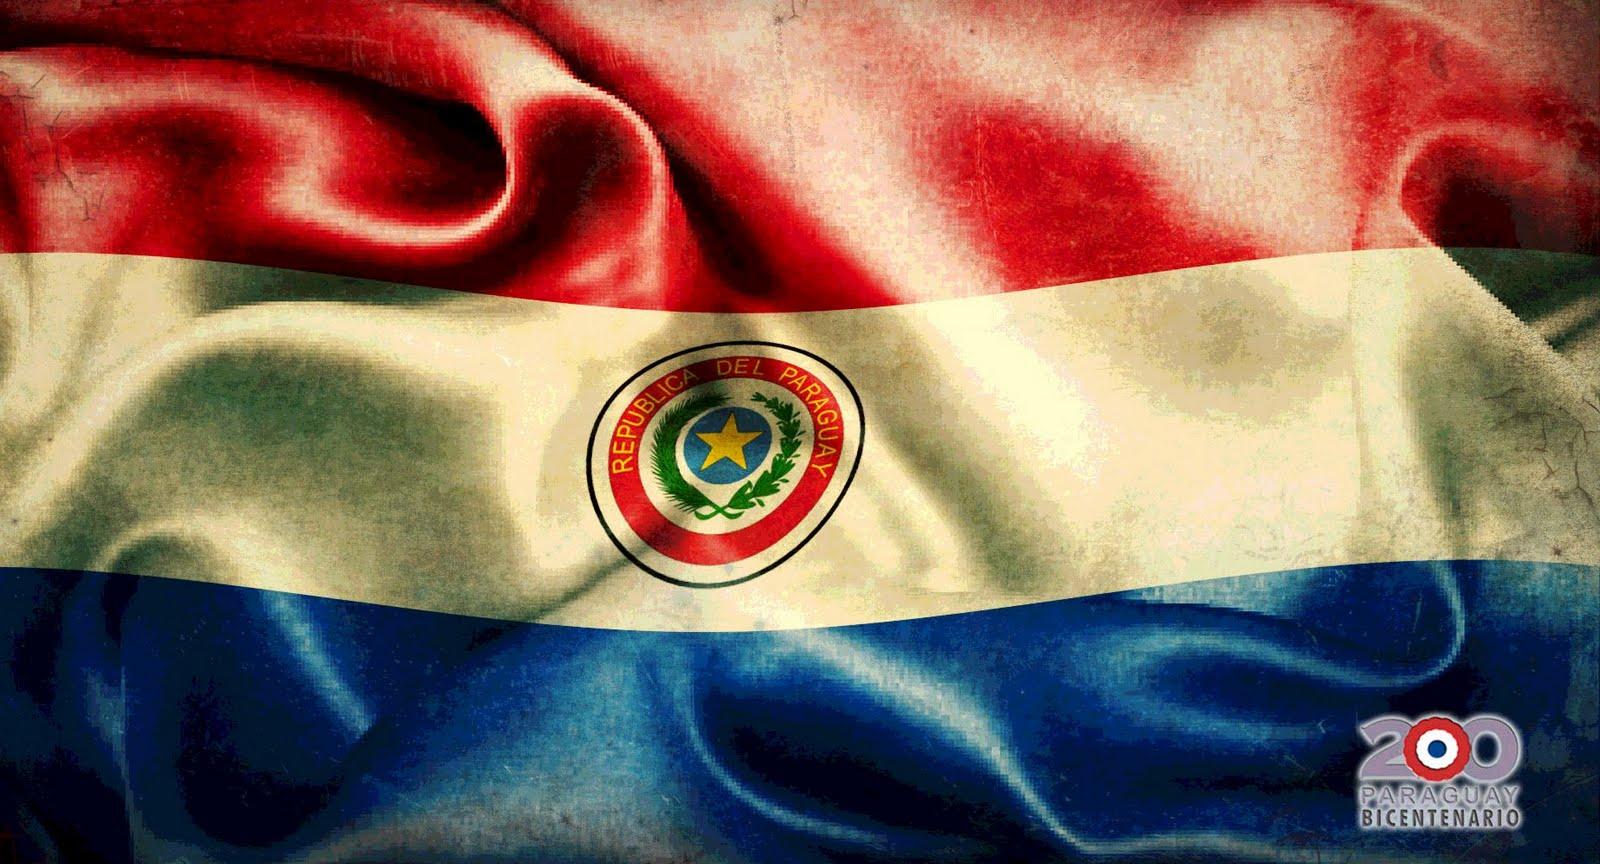 http://2.bp.blogspot.com/-MYpdHjyeBQc/Tc4OBKt7aoI/AAAAAAAABQ0/D58i9MpIk2c/s1600/bandera_paraguay_logo_bicentenario_fondo_pantalla.jpg